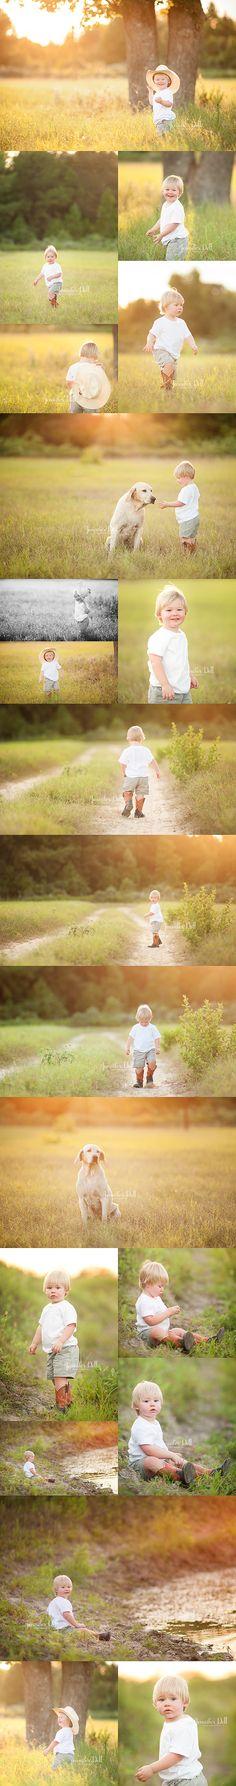 Country Road… Houston Child Photographer » Houston & Tomball Photographer – Child, Baby & Family Photography – 832-377-5893